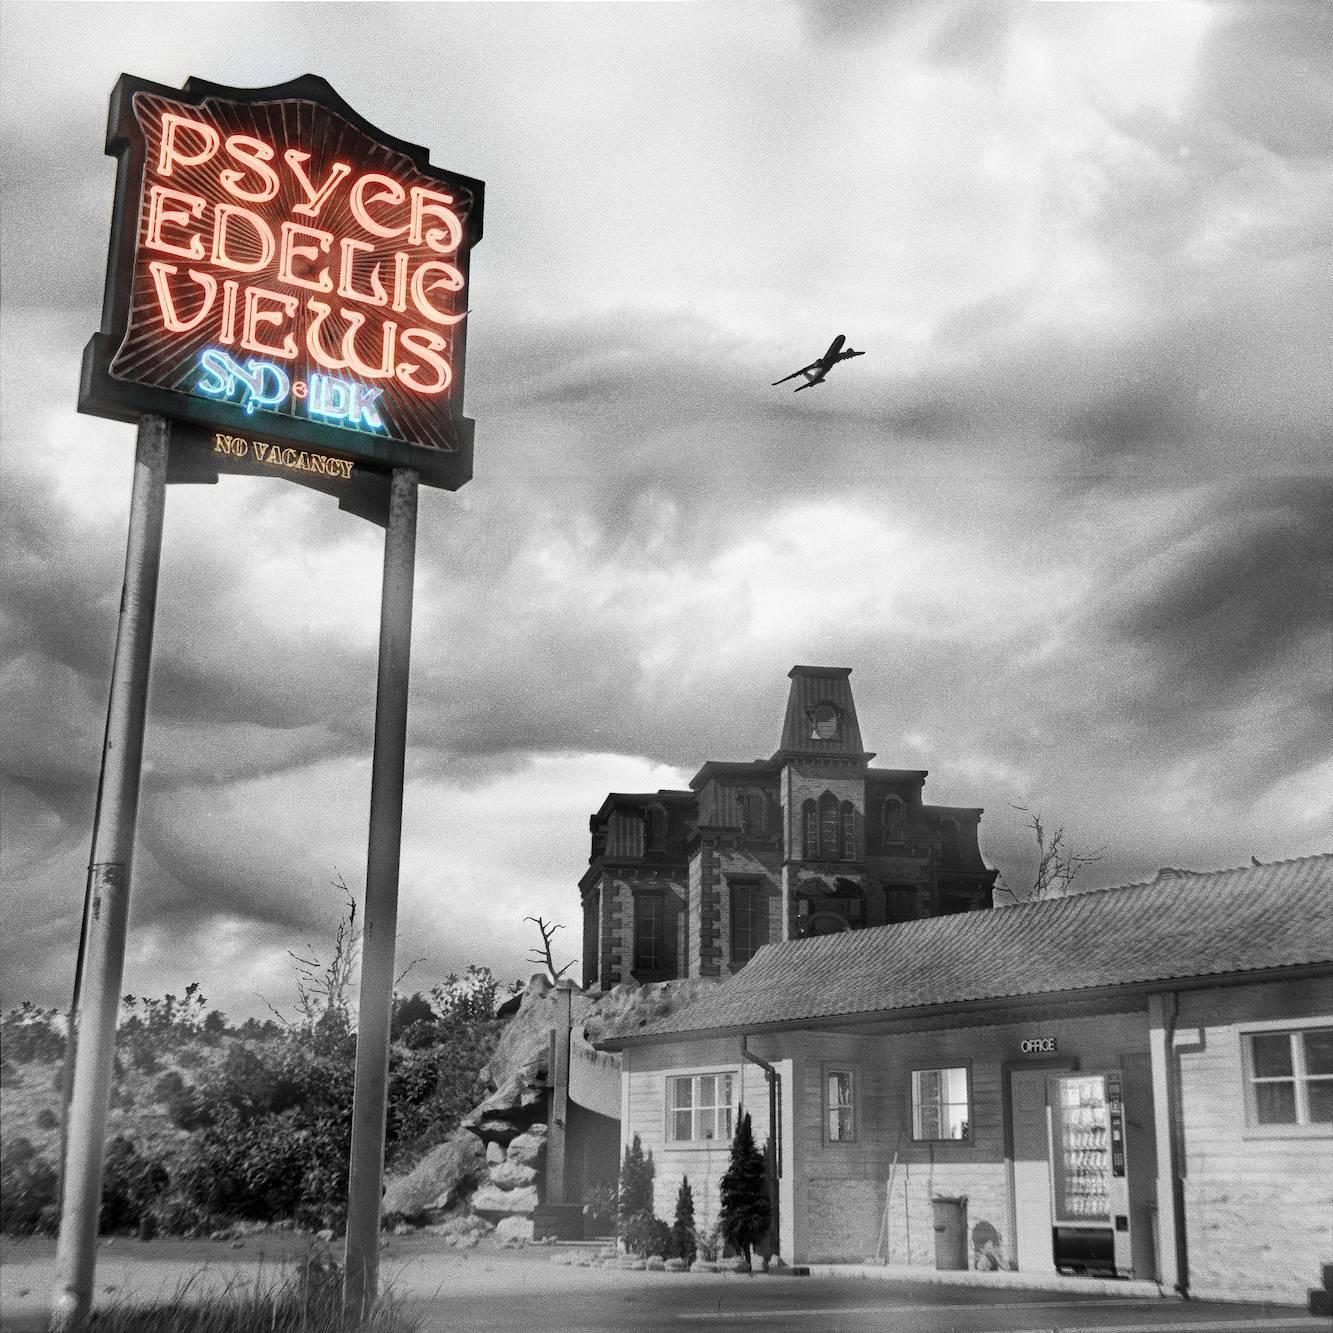 Sad Night Dynamite - Psychedelic Views (feat. IDK)